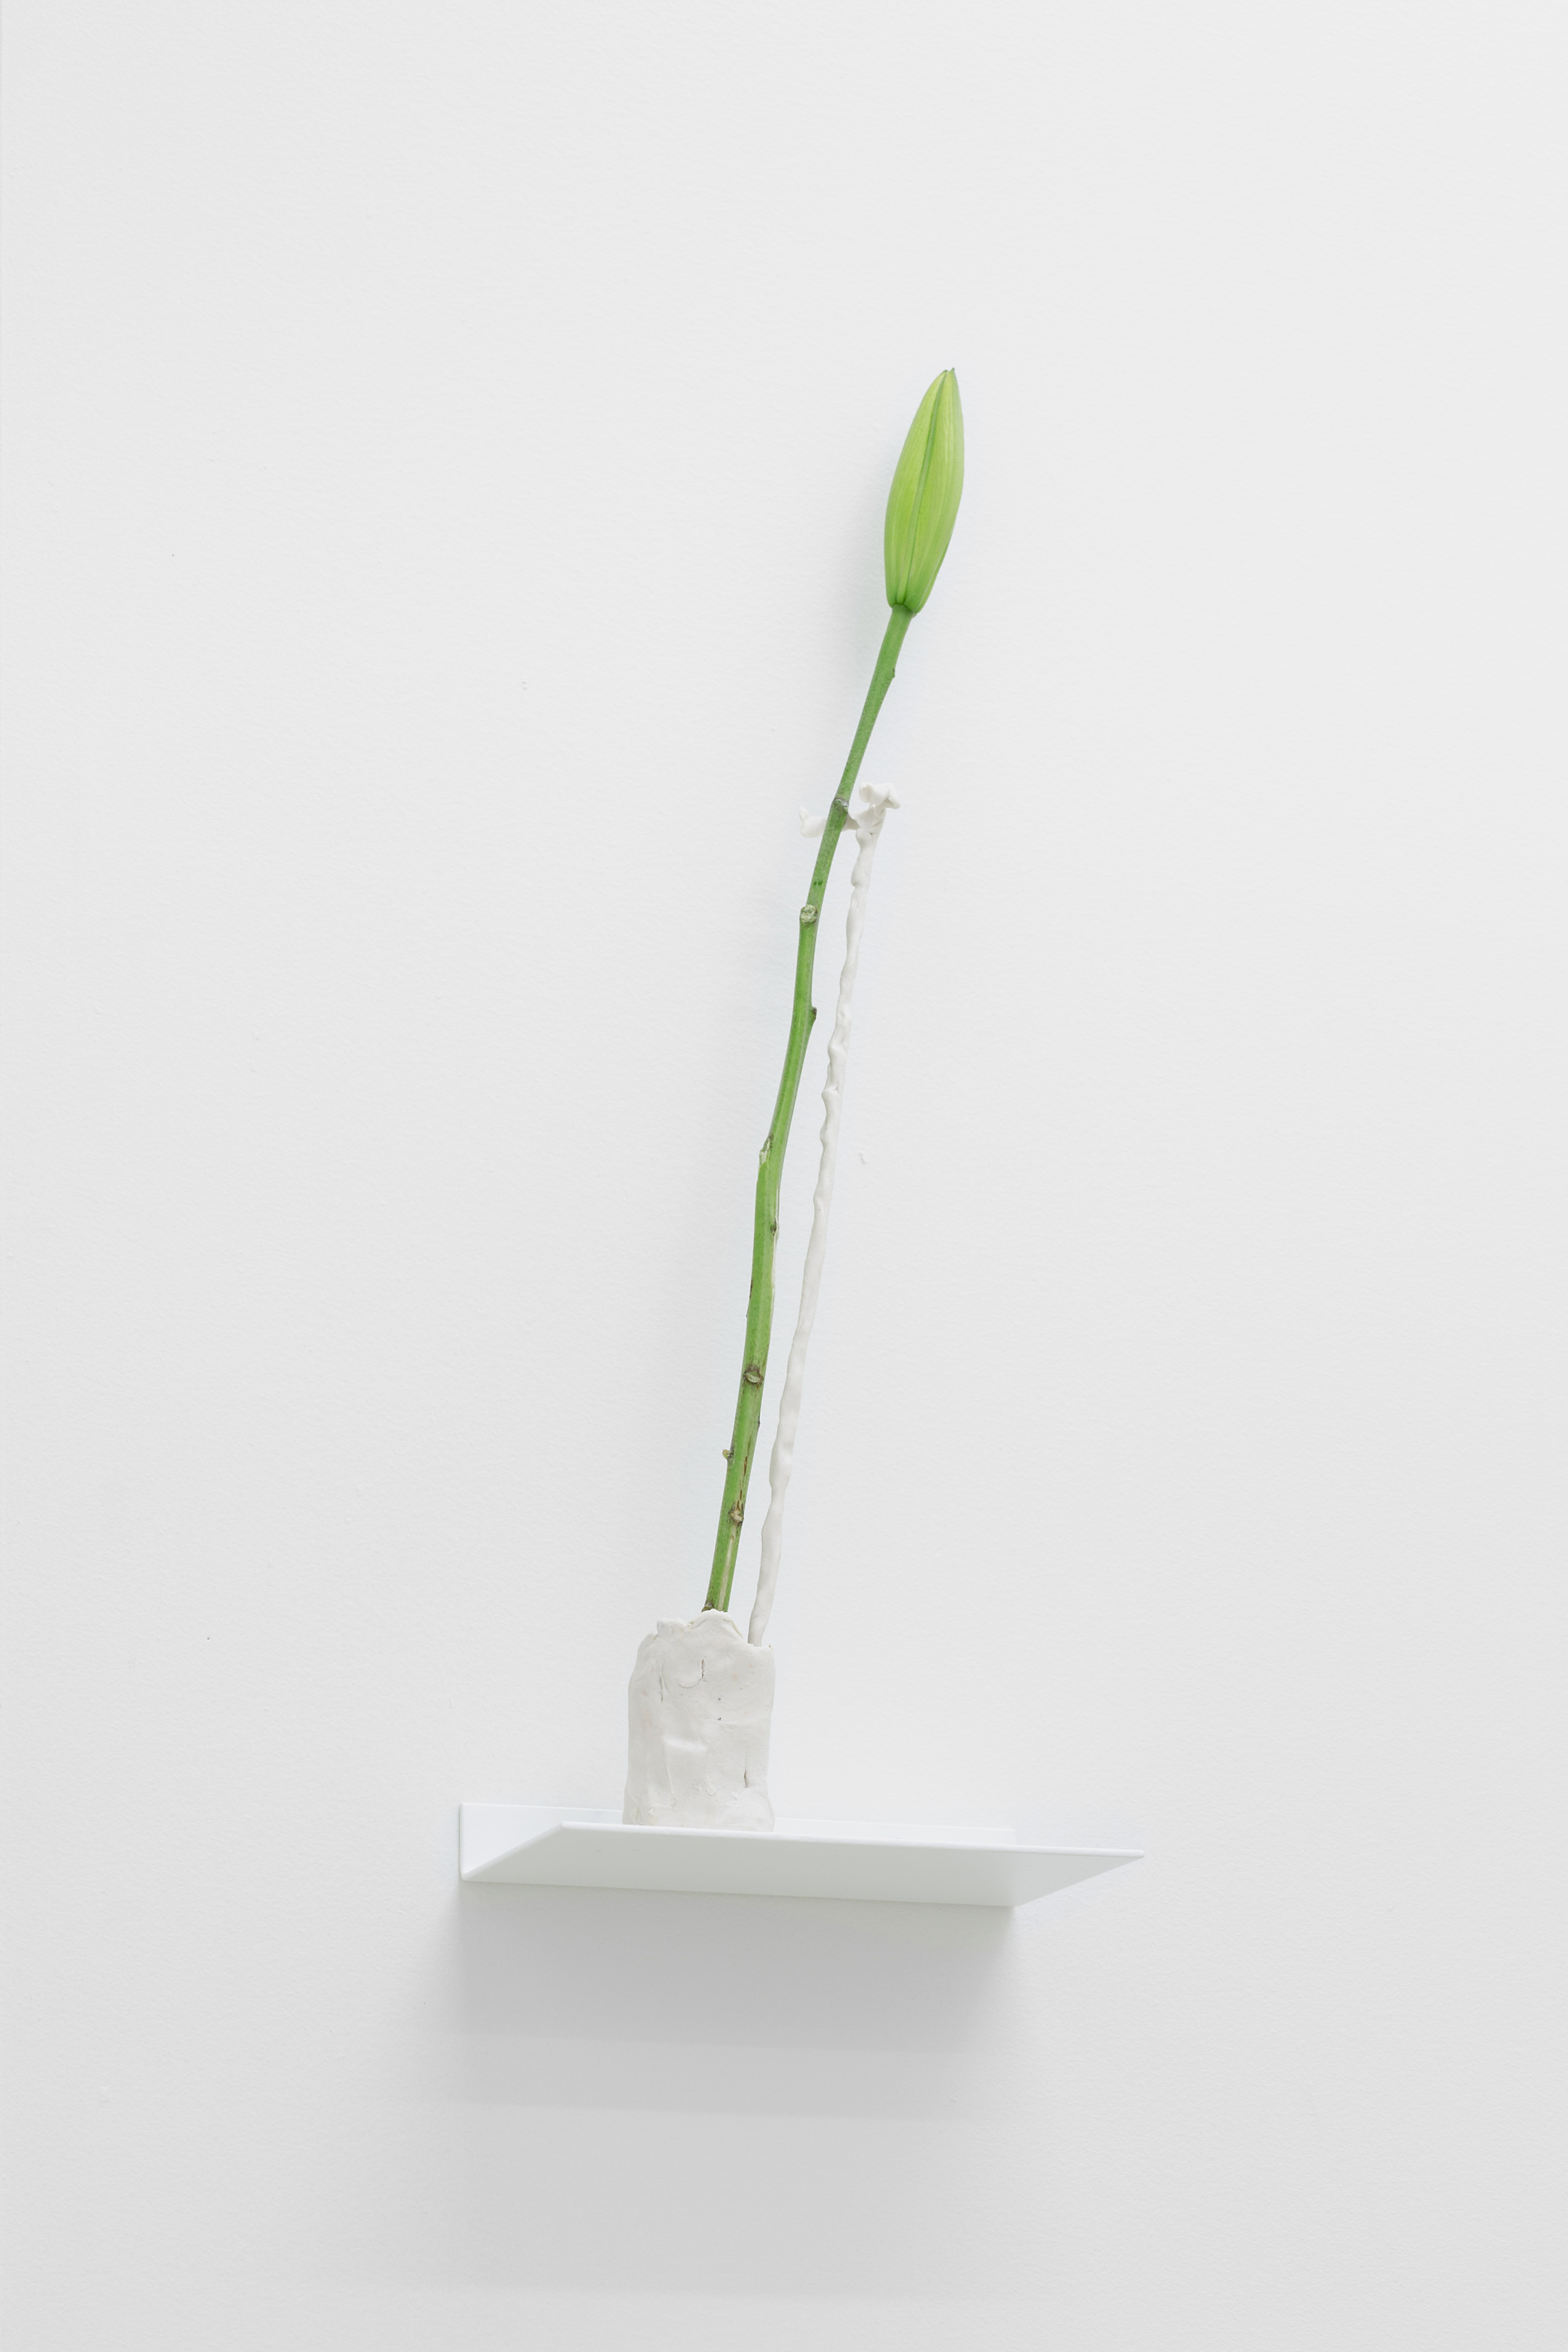 "a bibliography (Sound Screen) Porcelain vessel, porcelain crutch, 6×10"" powder coated custom steel shelf, stargazer lily 2019"